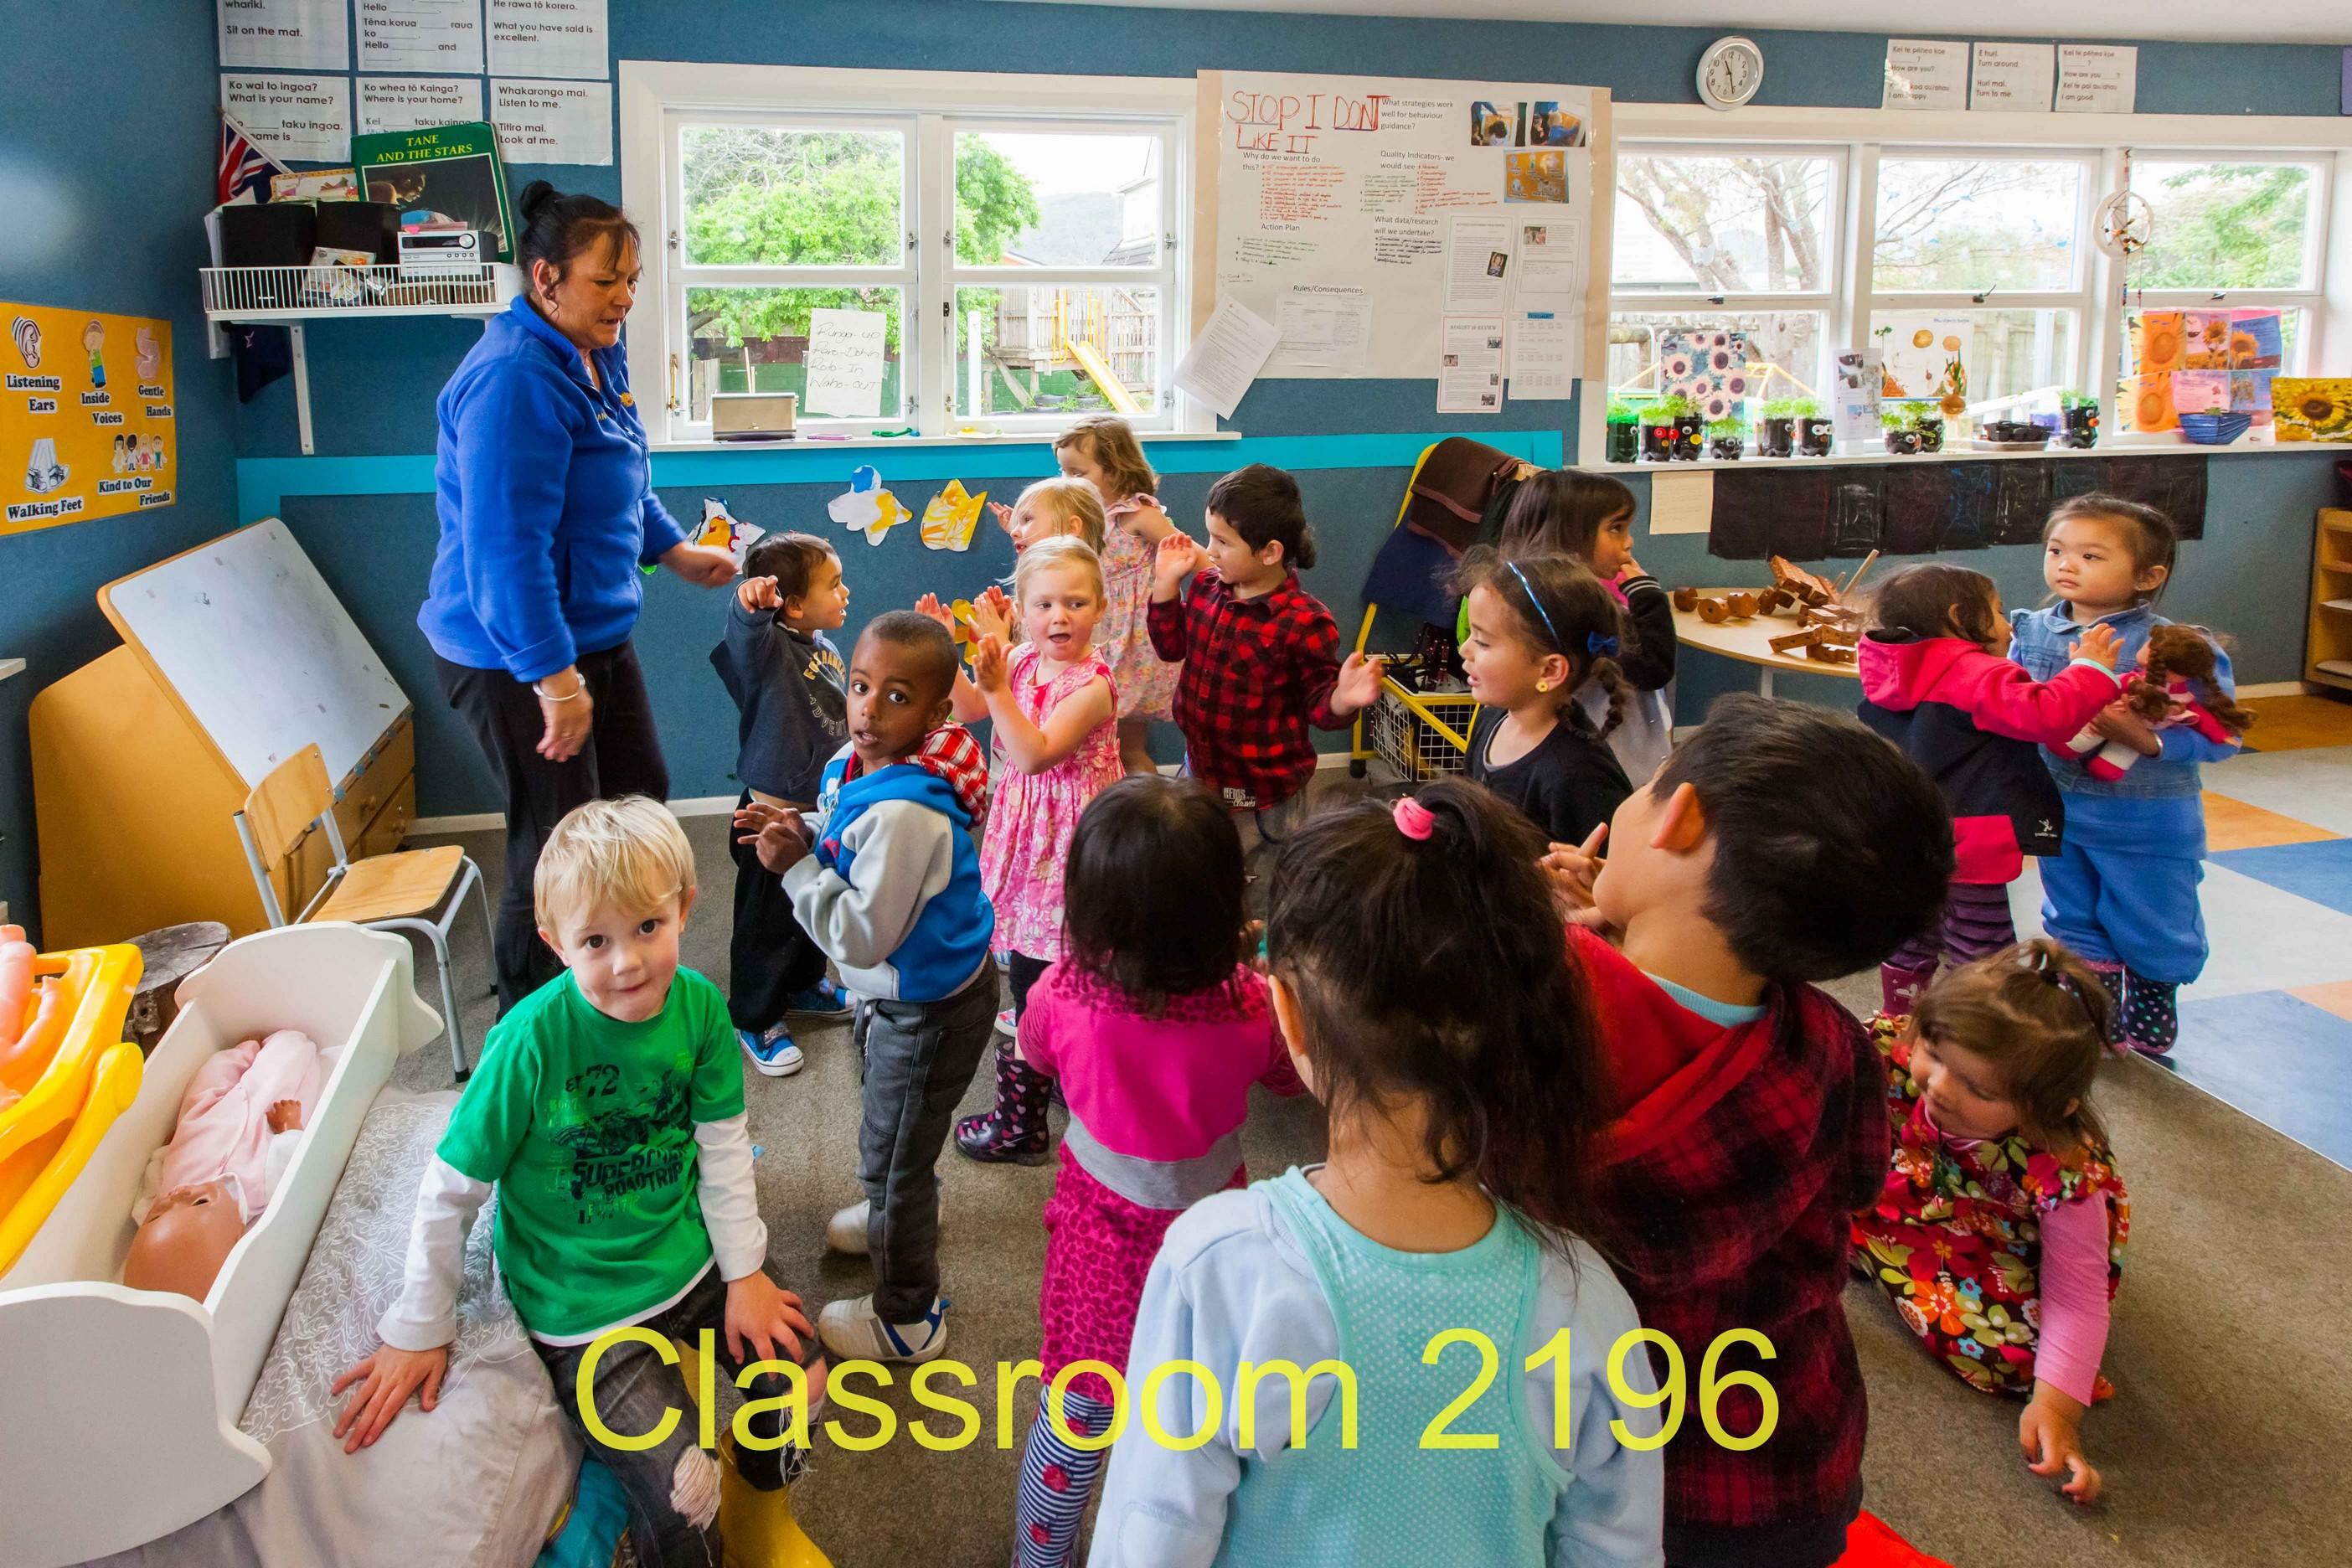 Classroom 2196